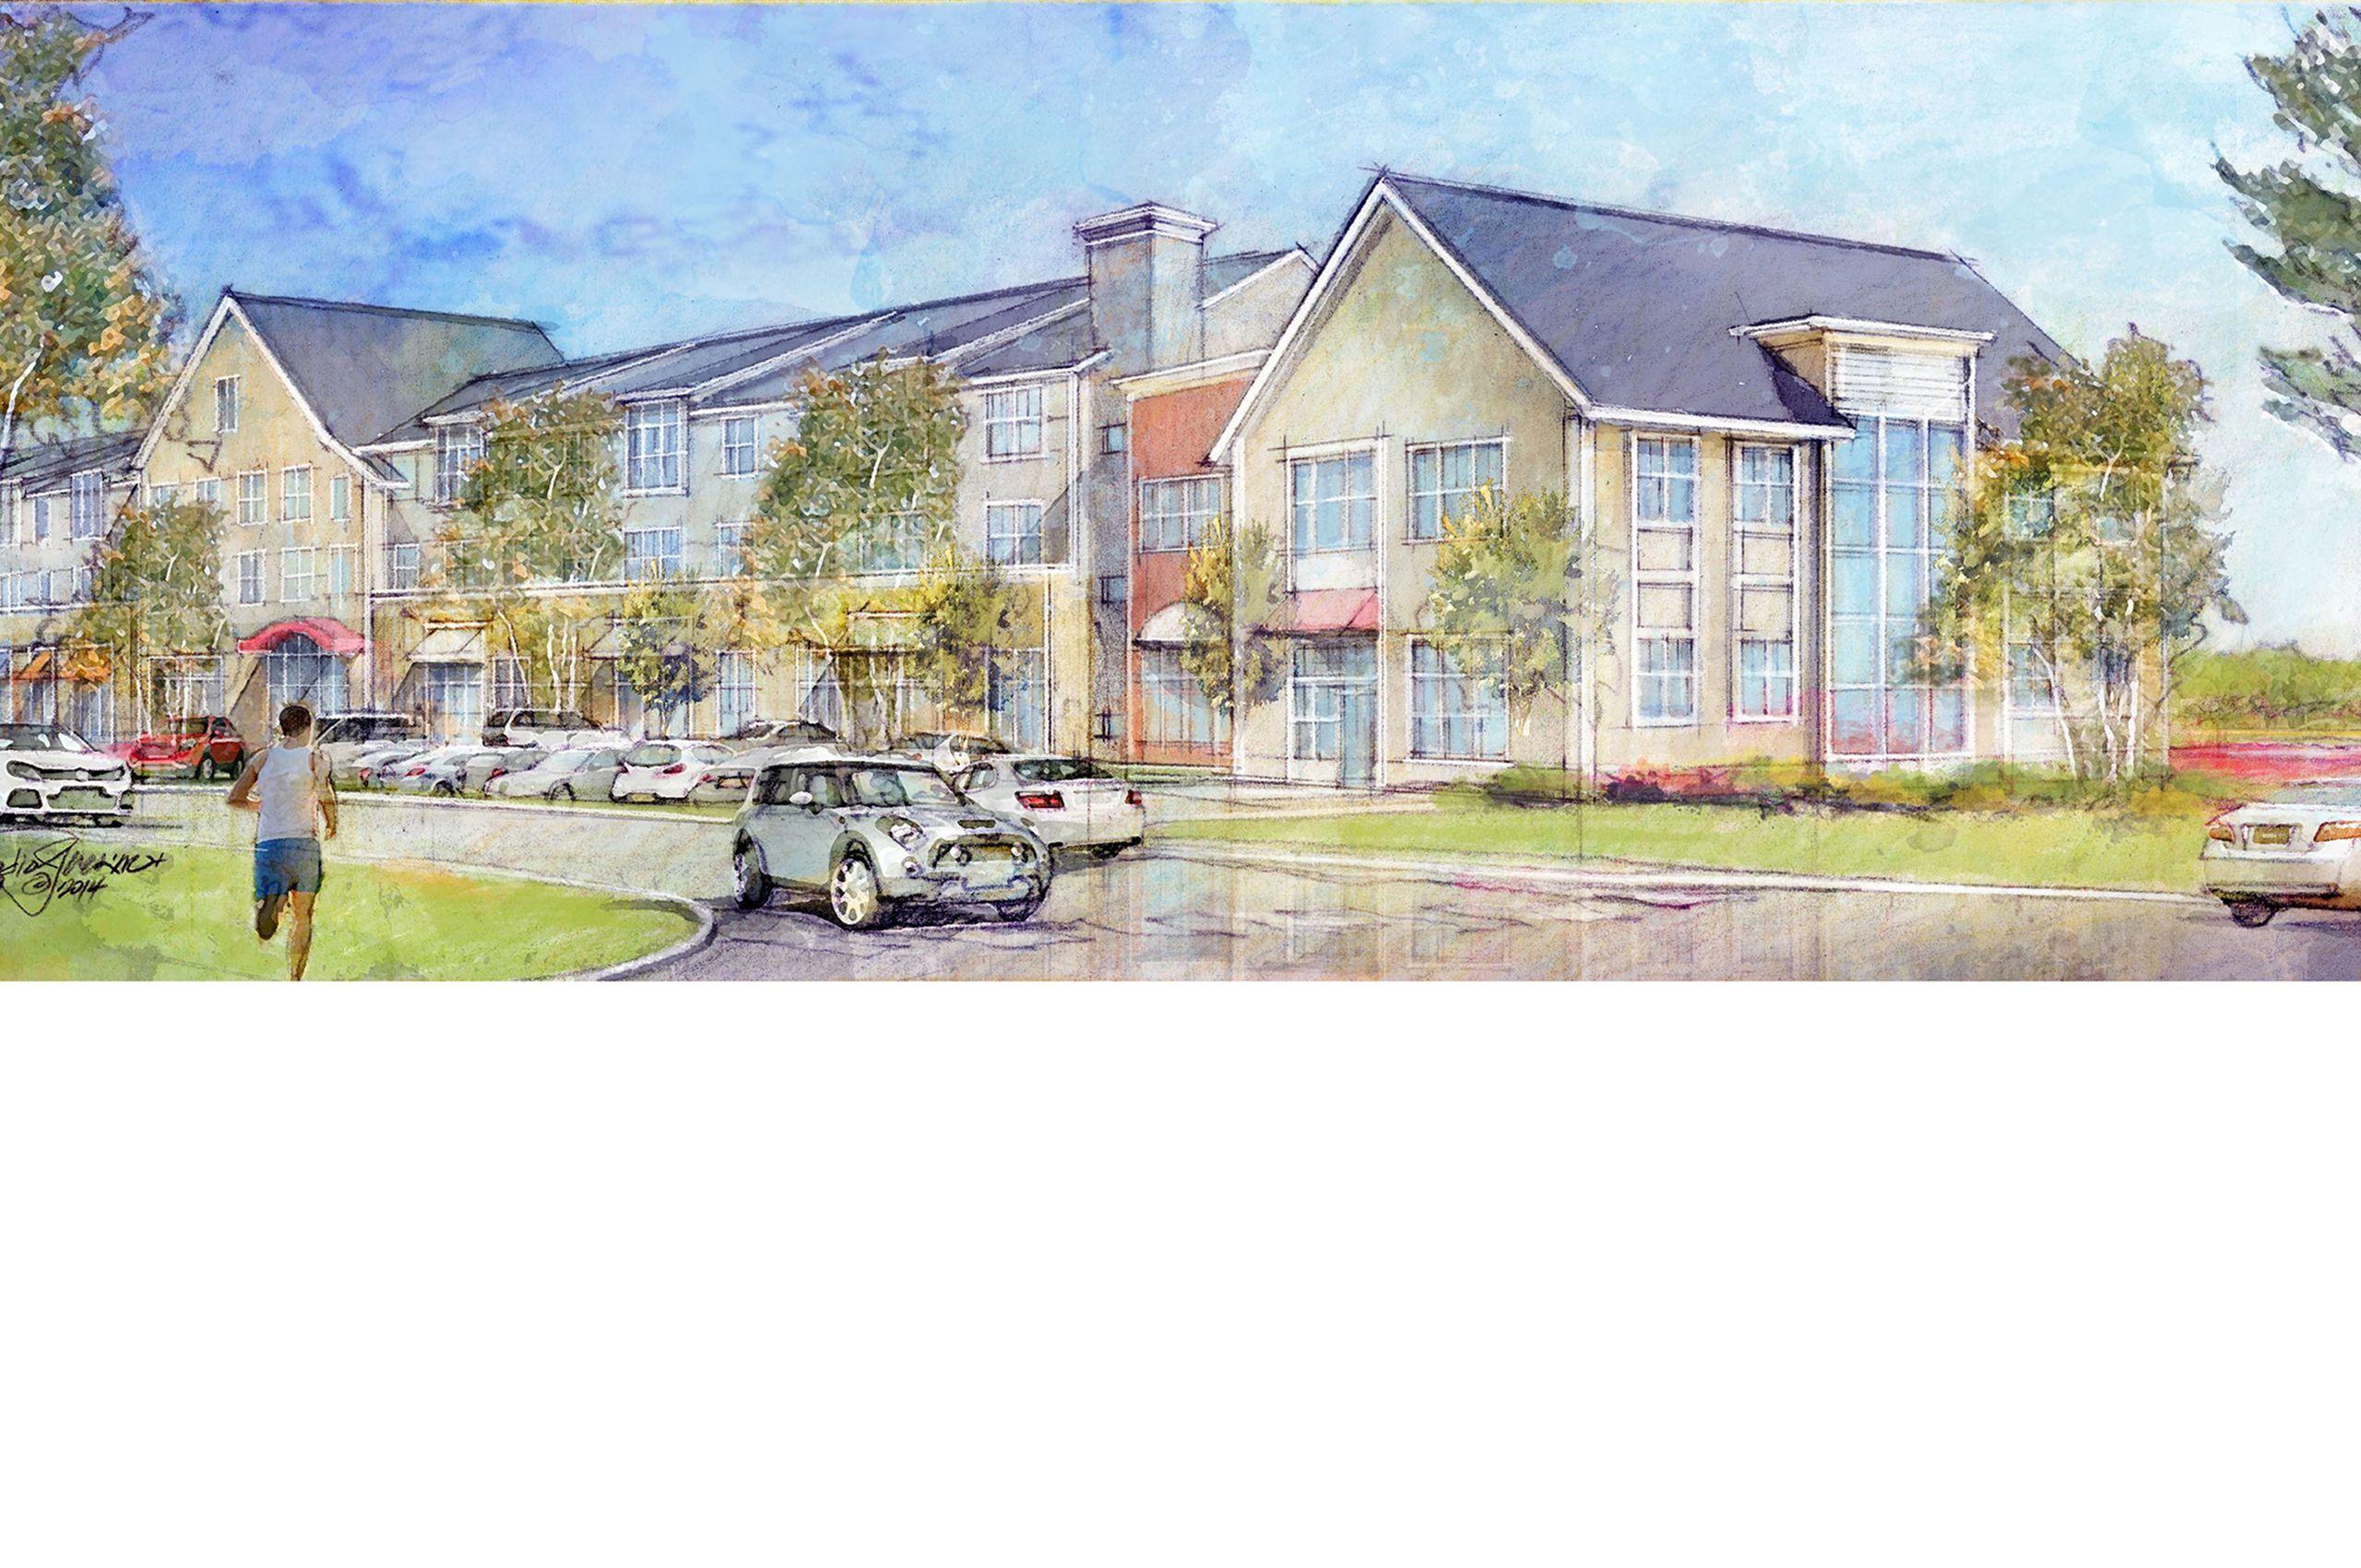 ResidencesatRosebrookPlace-Wareham-MA-EntryPerspective.jpg